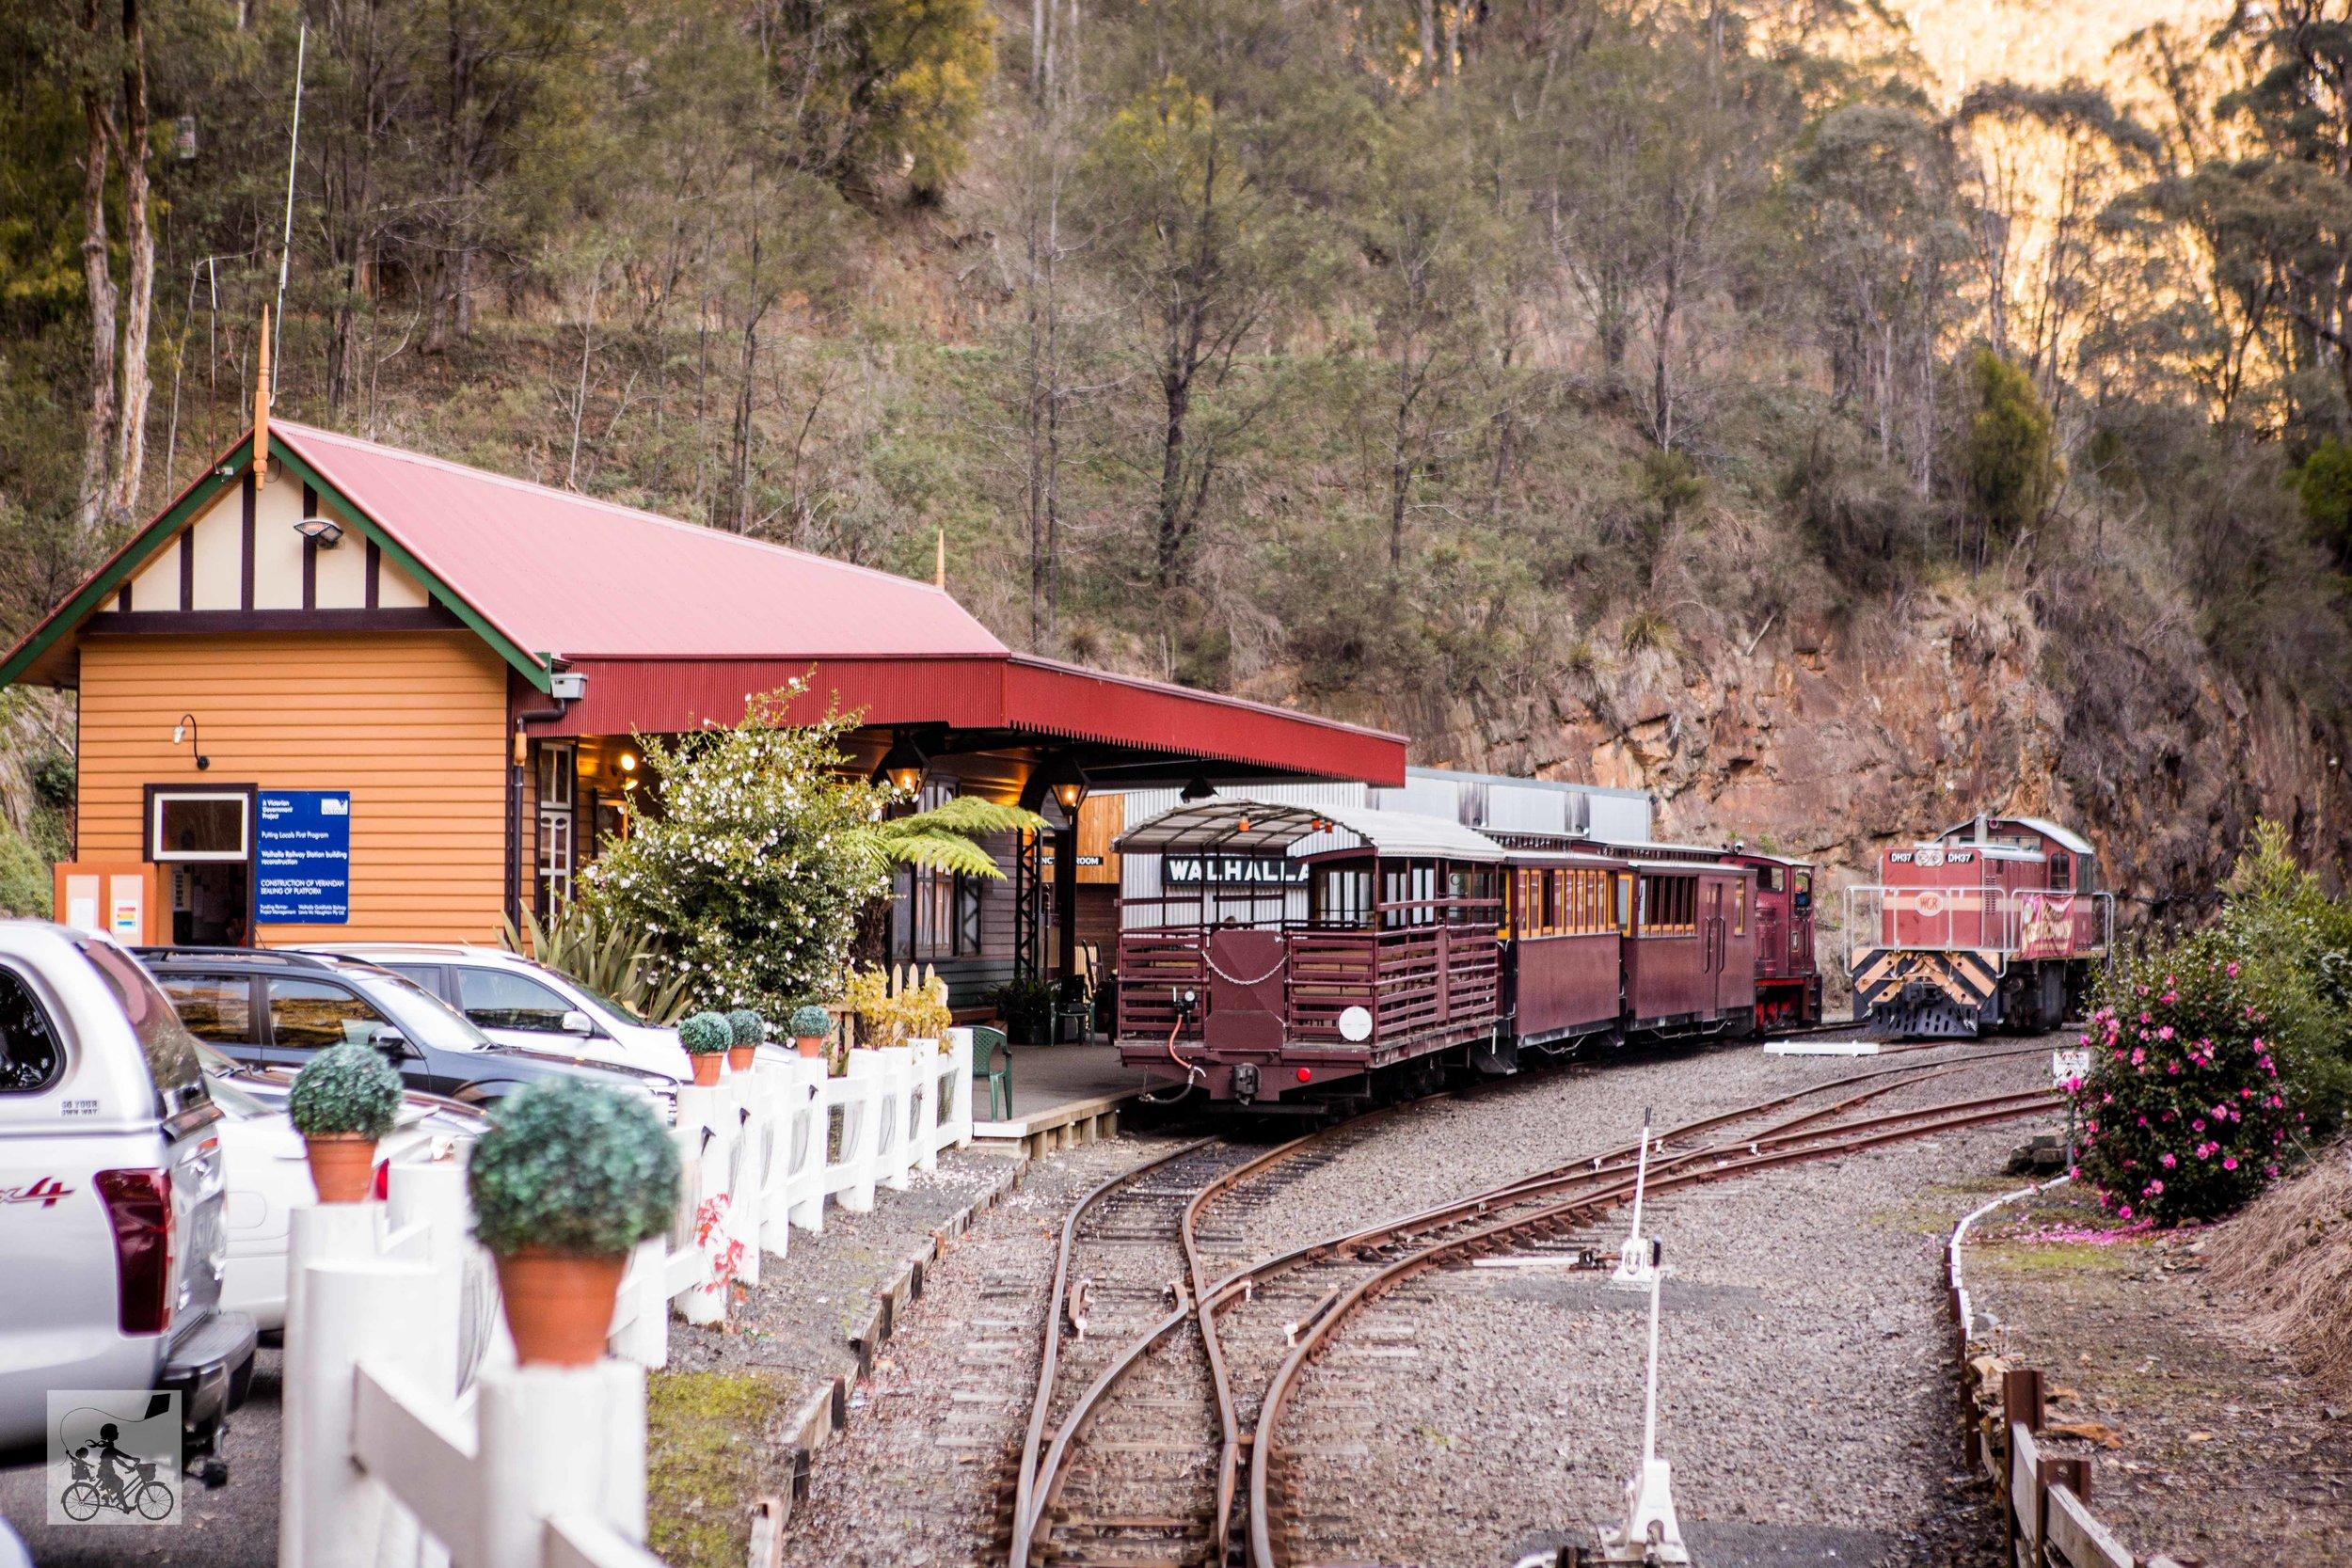 Walhalla Goldfields Railway - Mamma Knows East (48 of 48).jpg